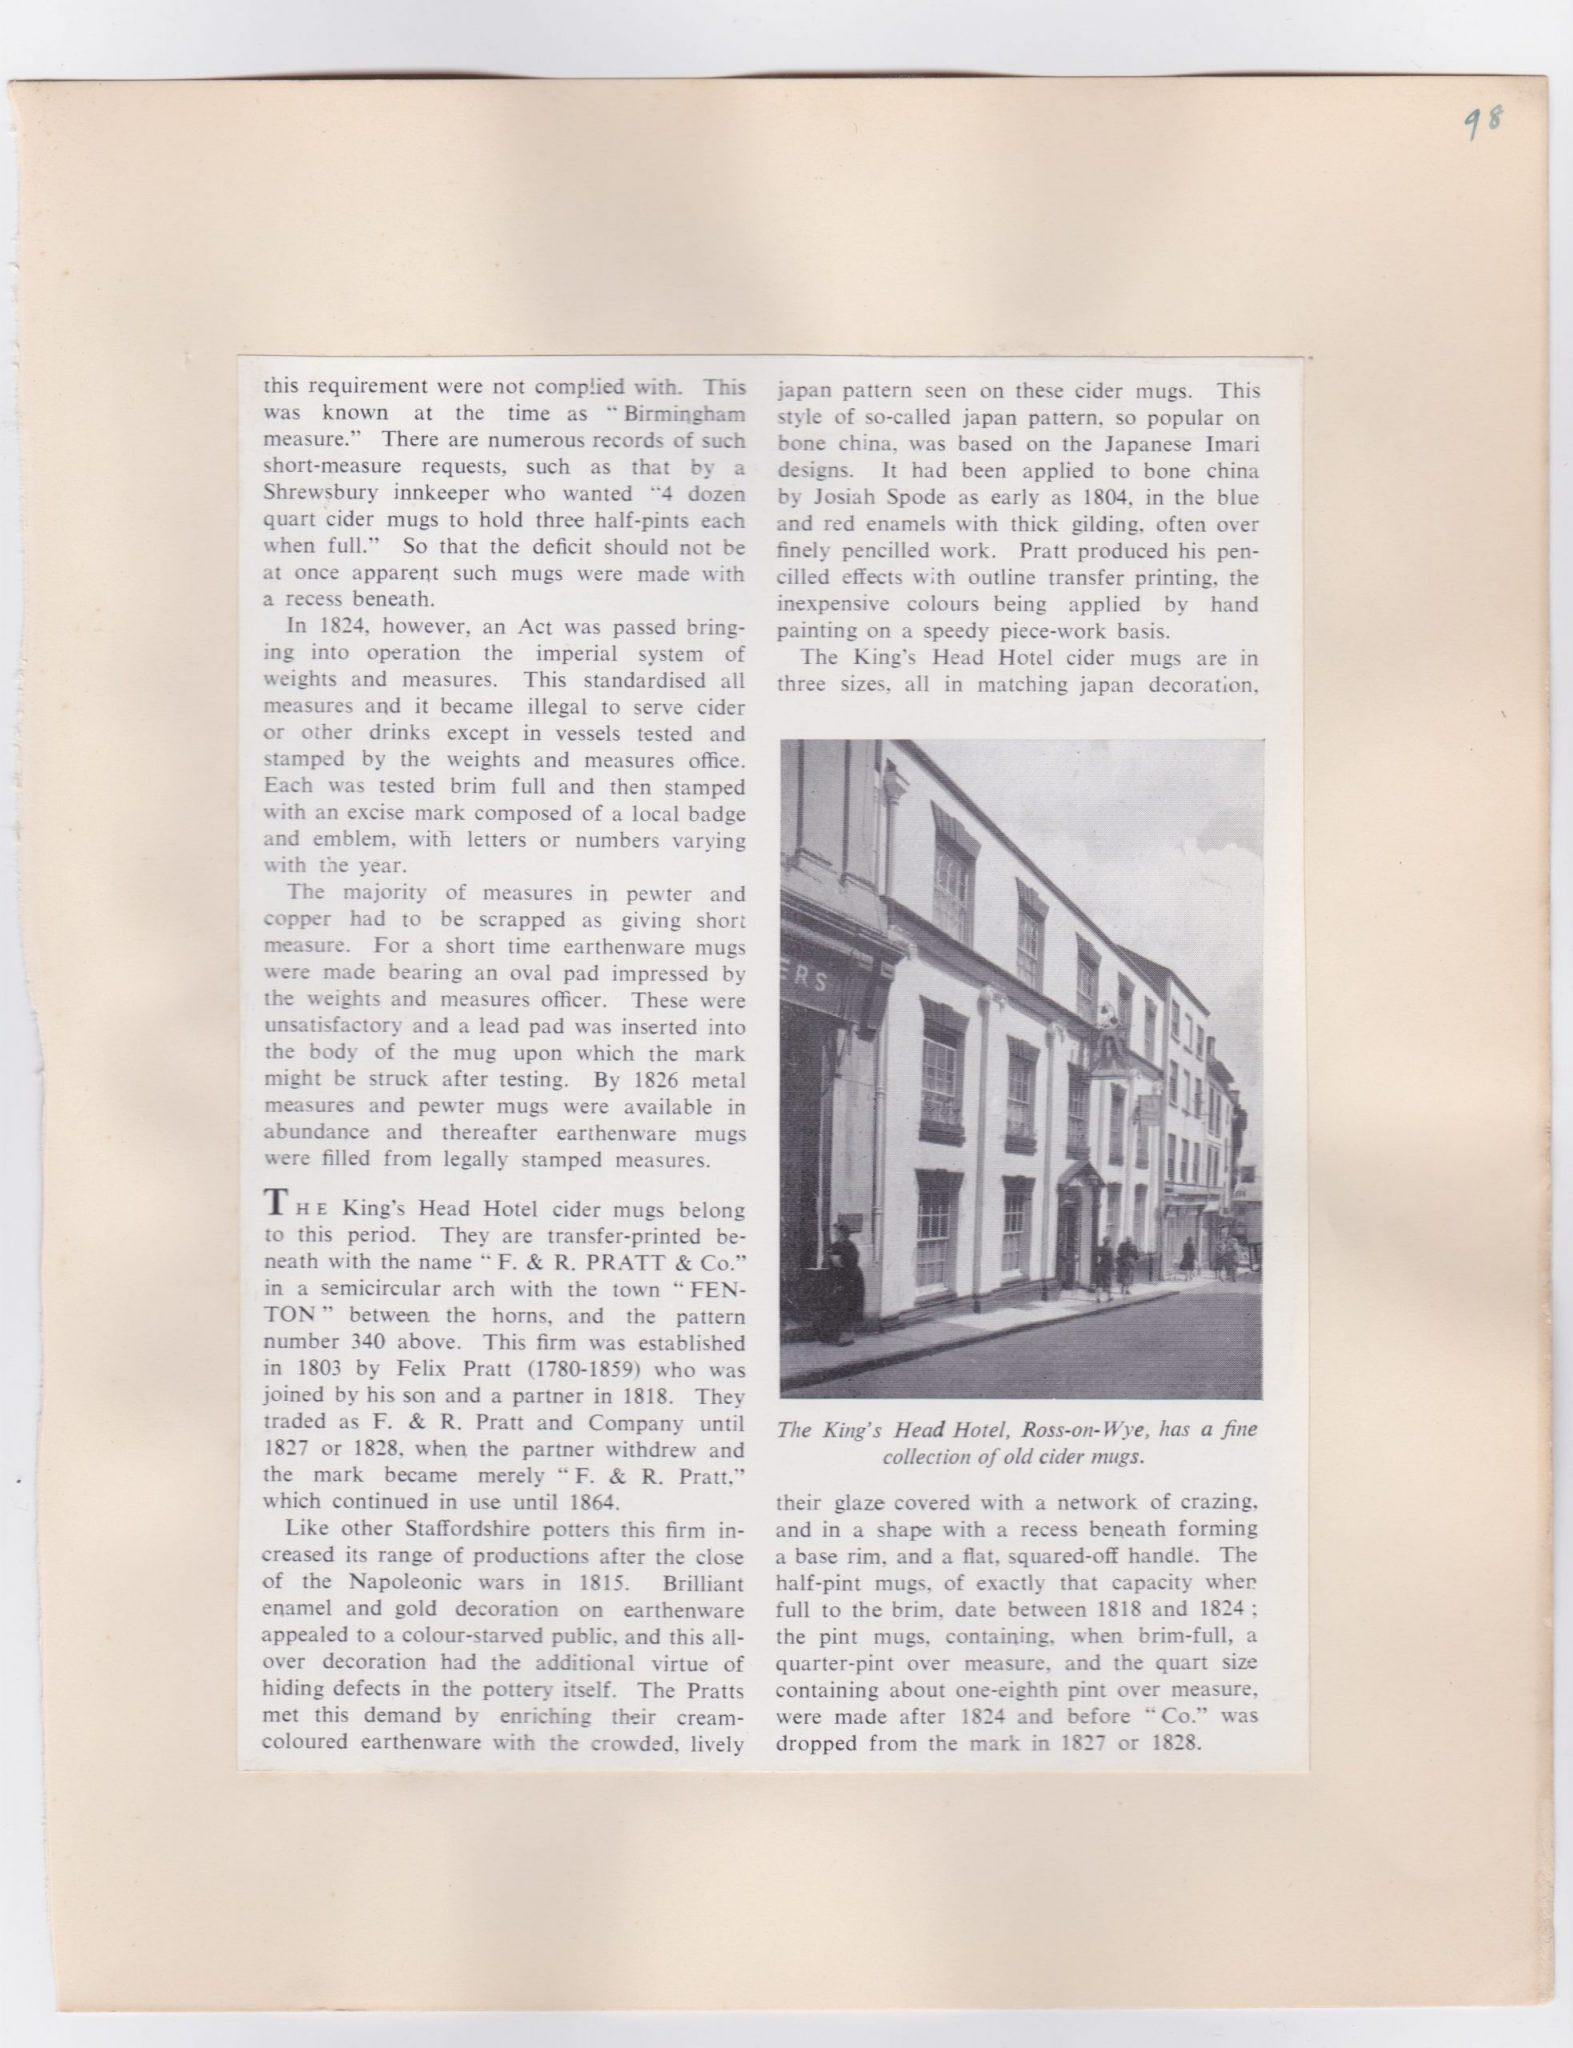 A Pub History Scrapbook Archive 42